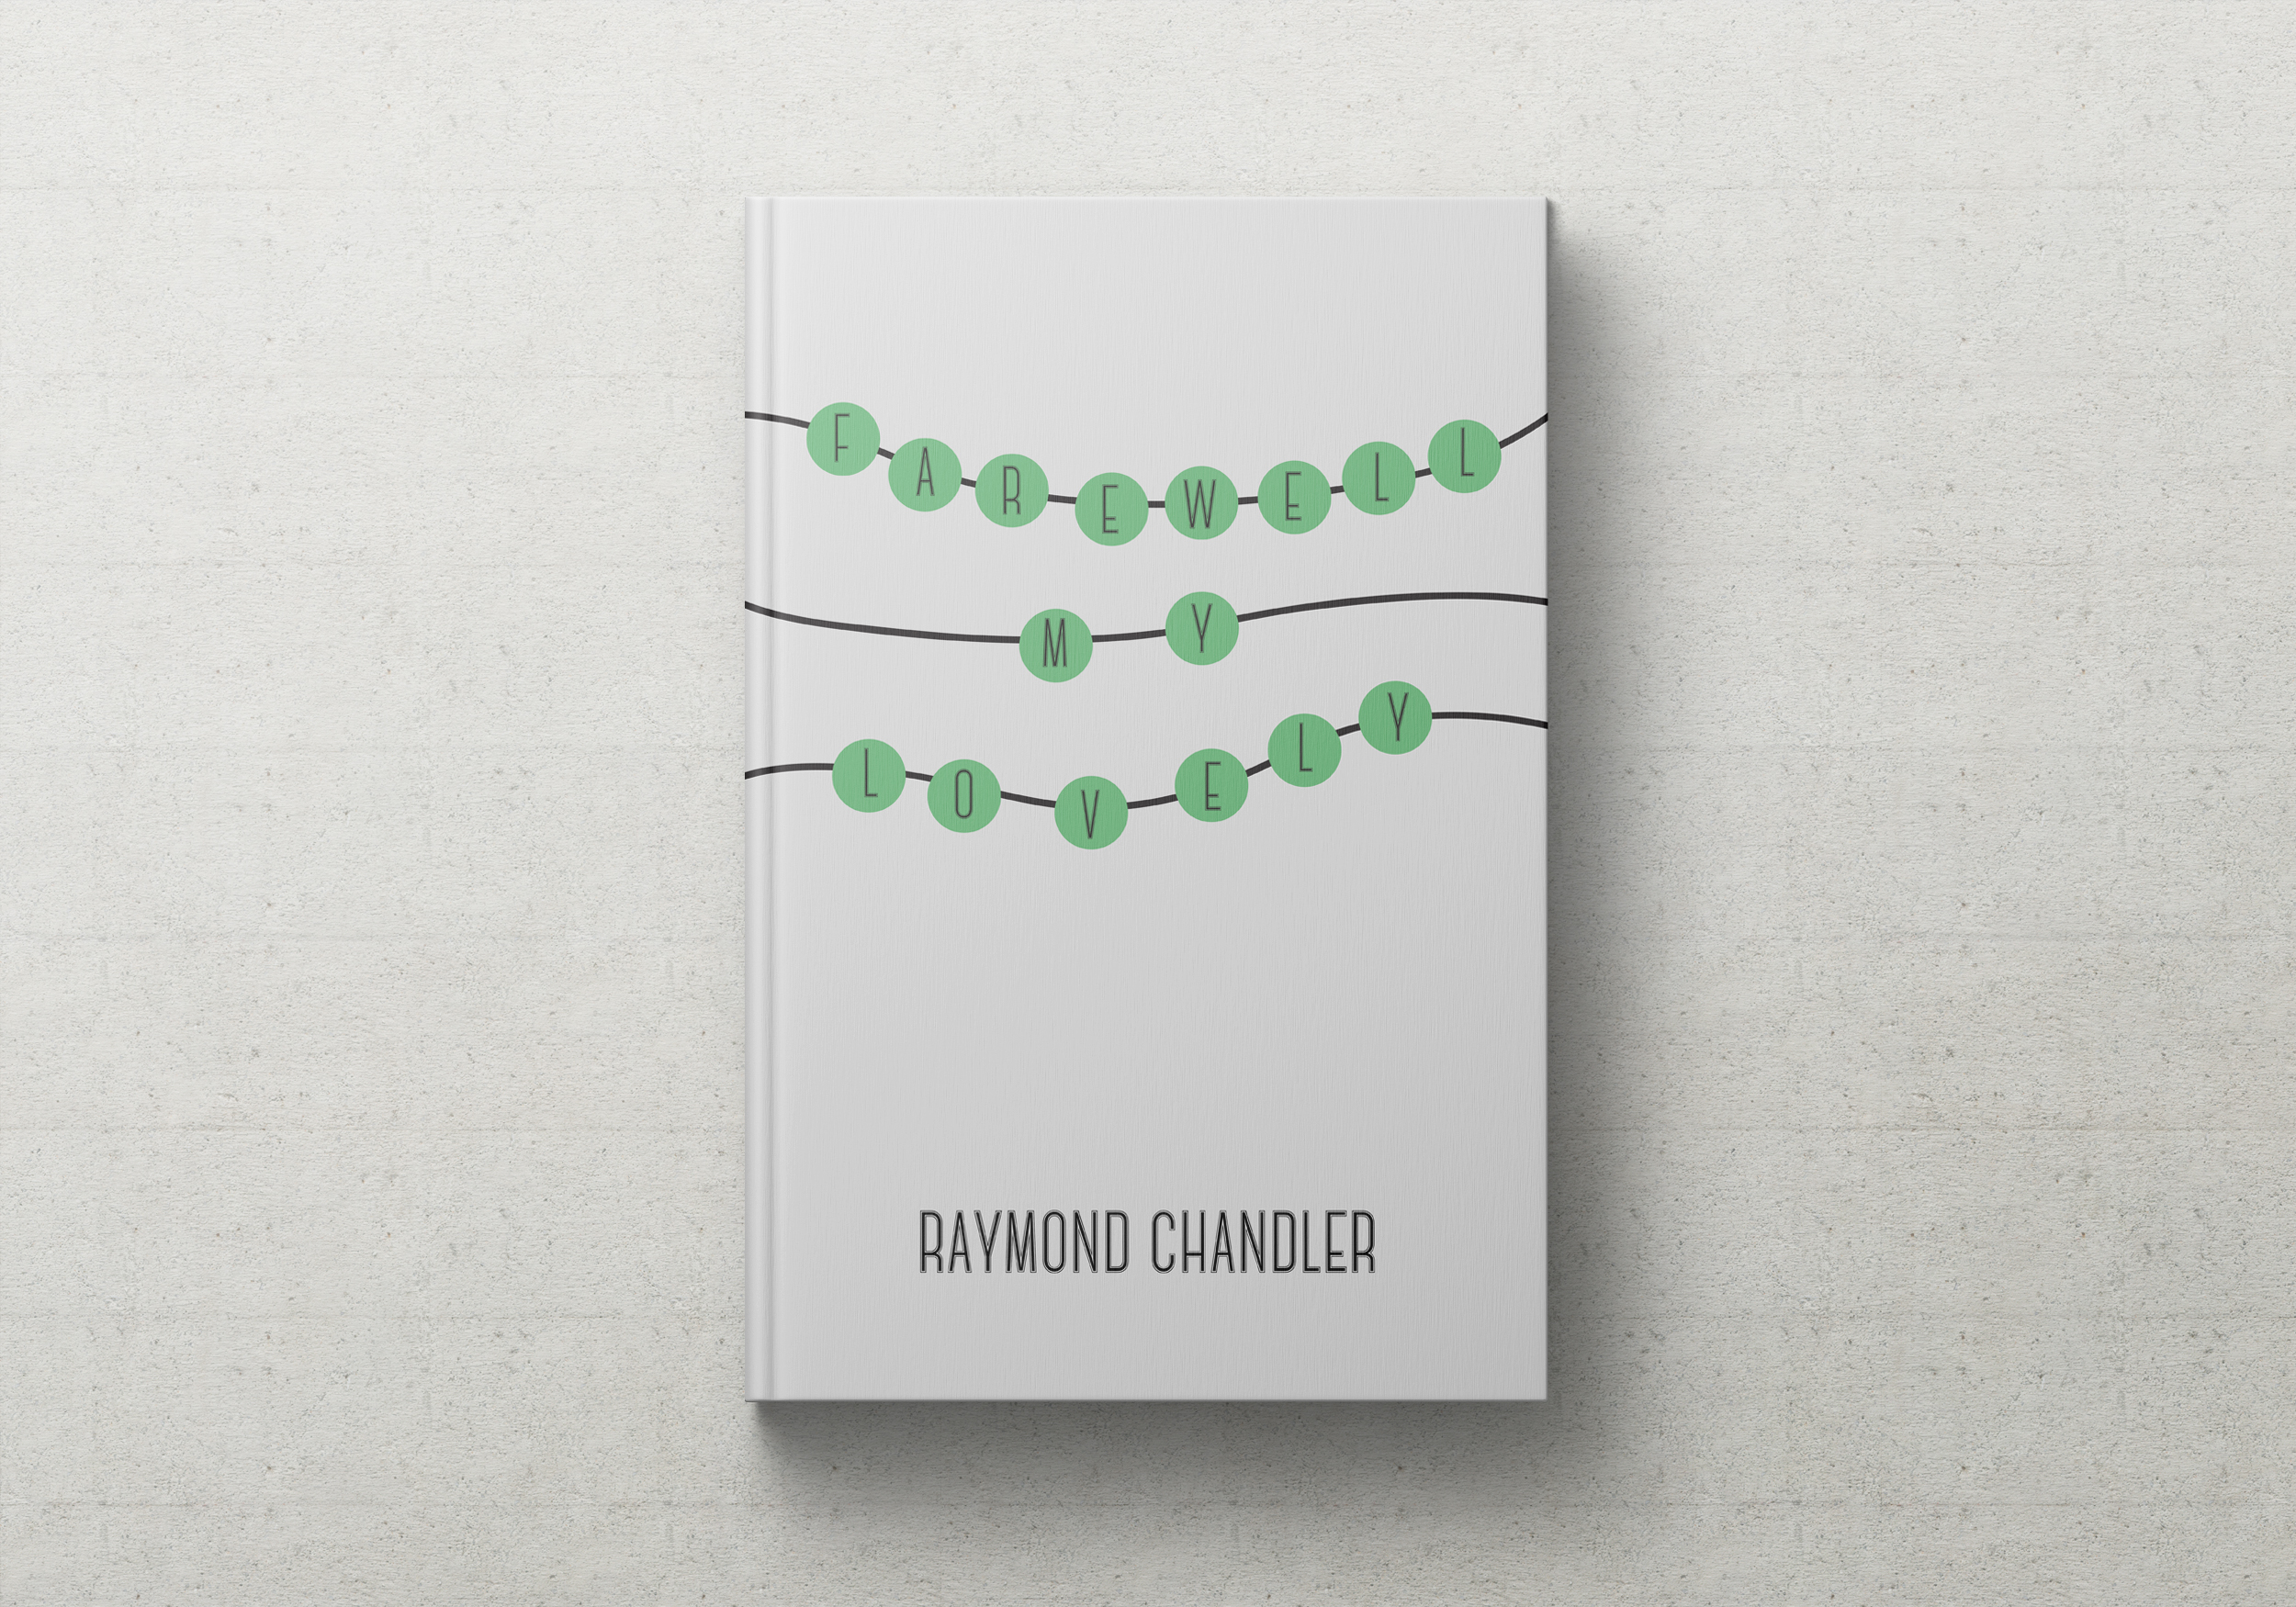 FAREWELL, MY LOVELY Raymond Chandler